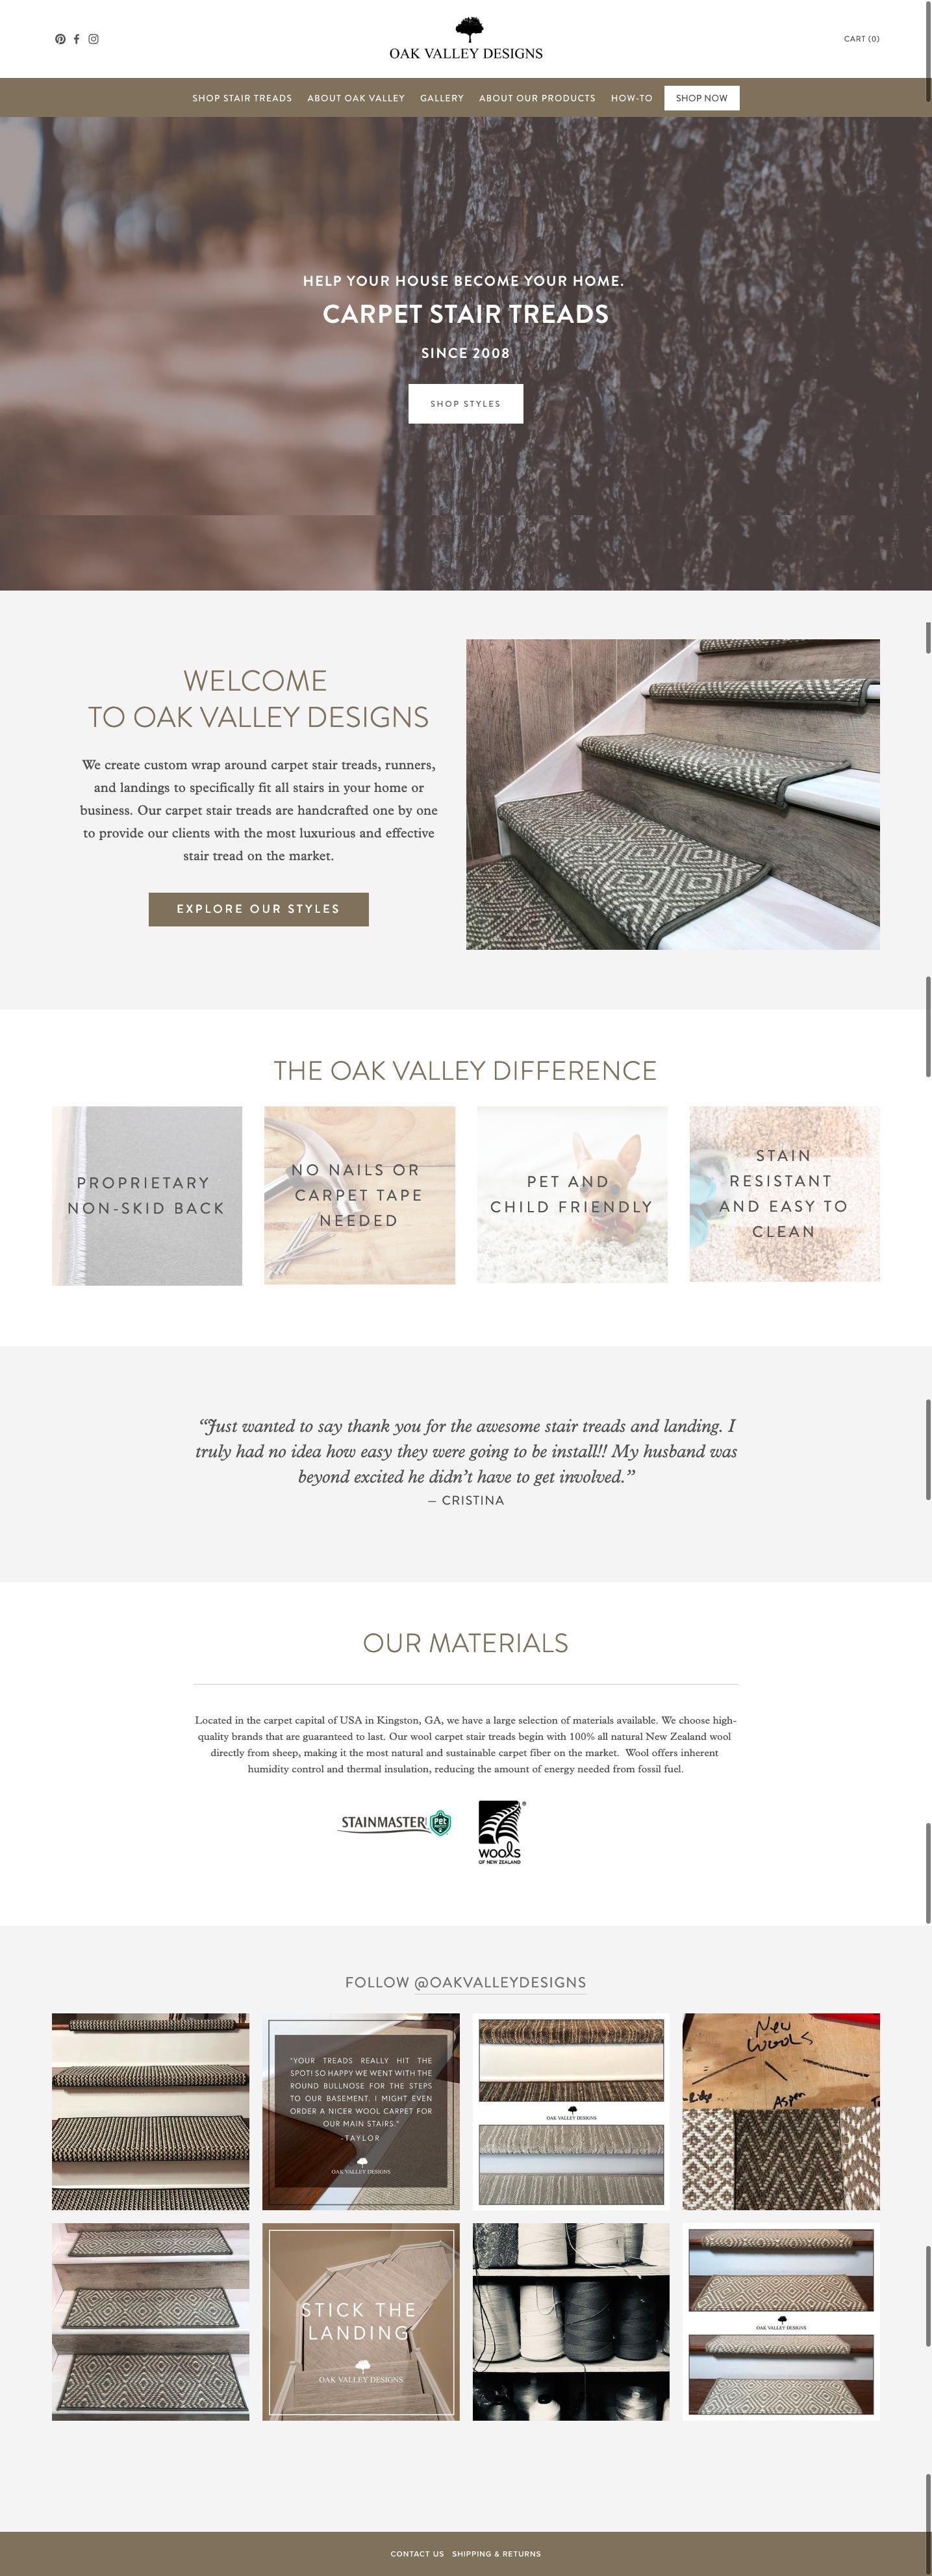 Oak Valley Designs - Website Upgrade